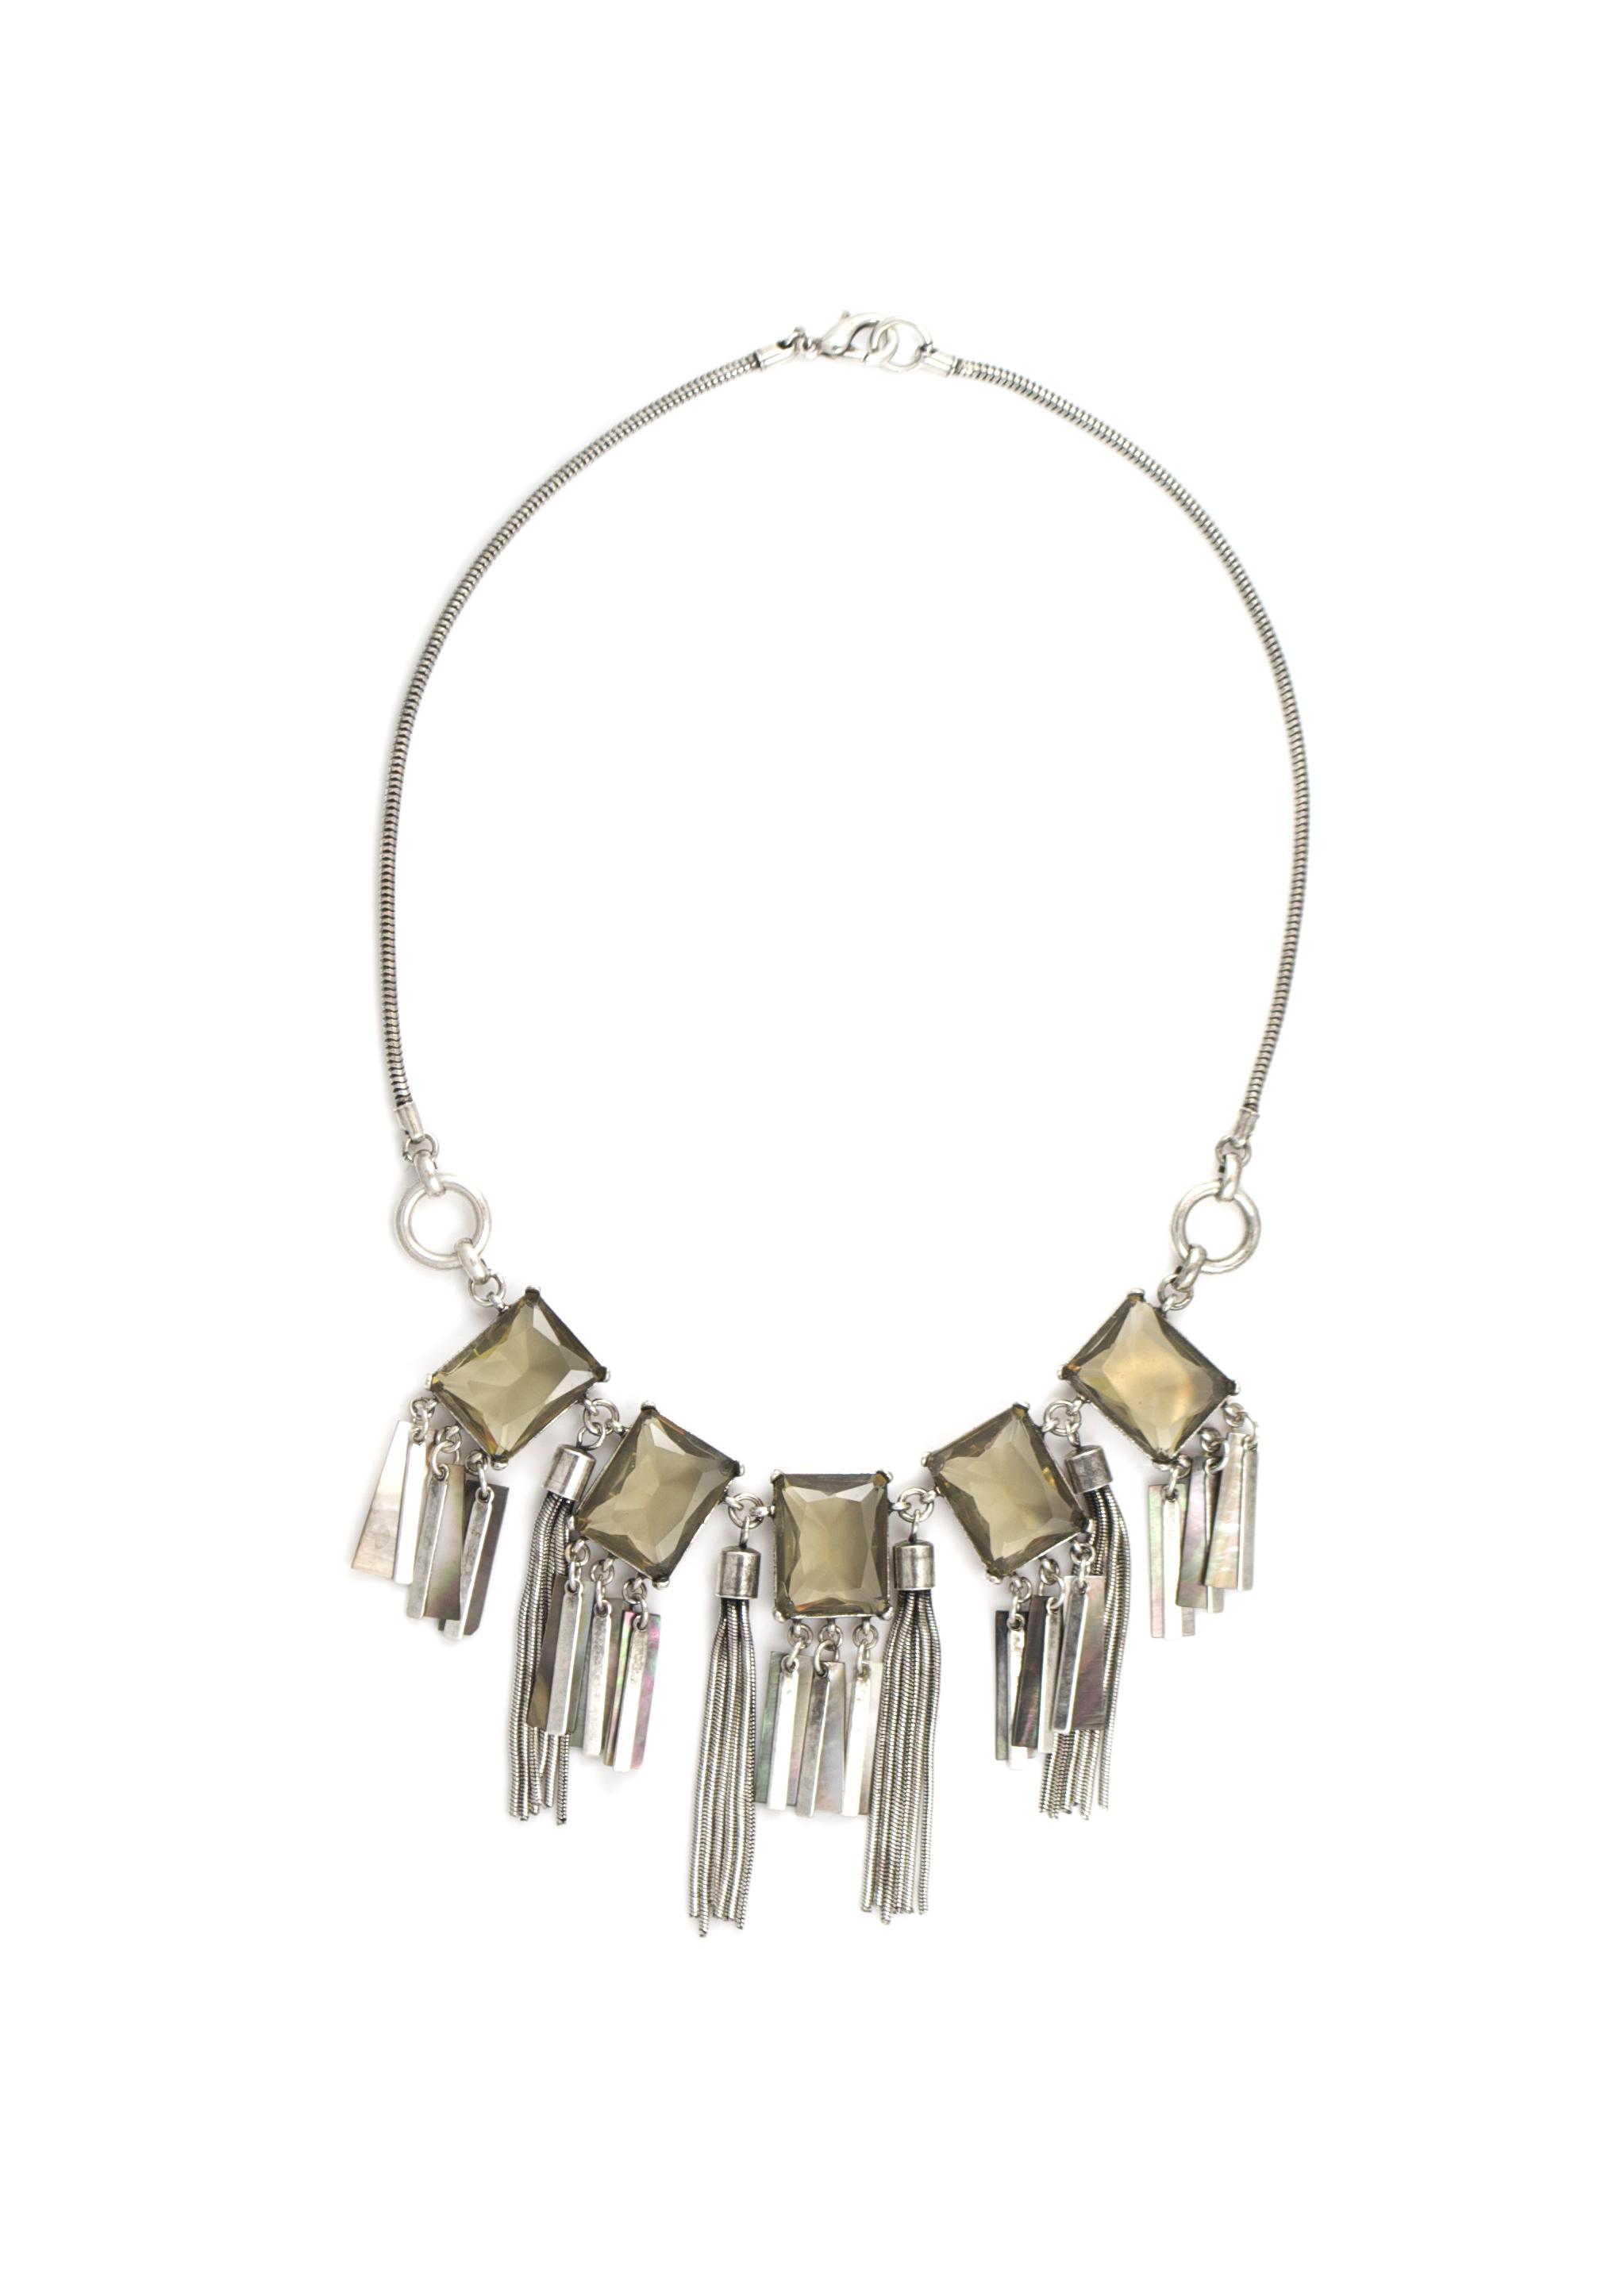 Smokey Shimmer necklace, available at  Gerard Yosca .